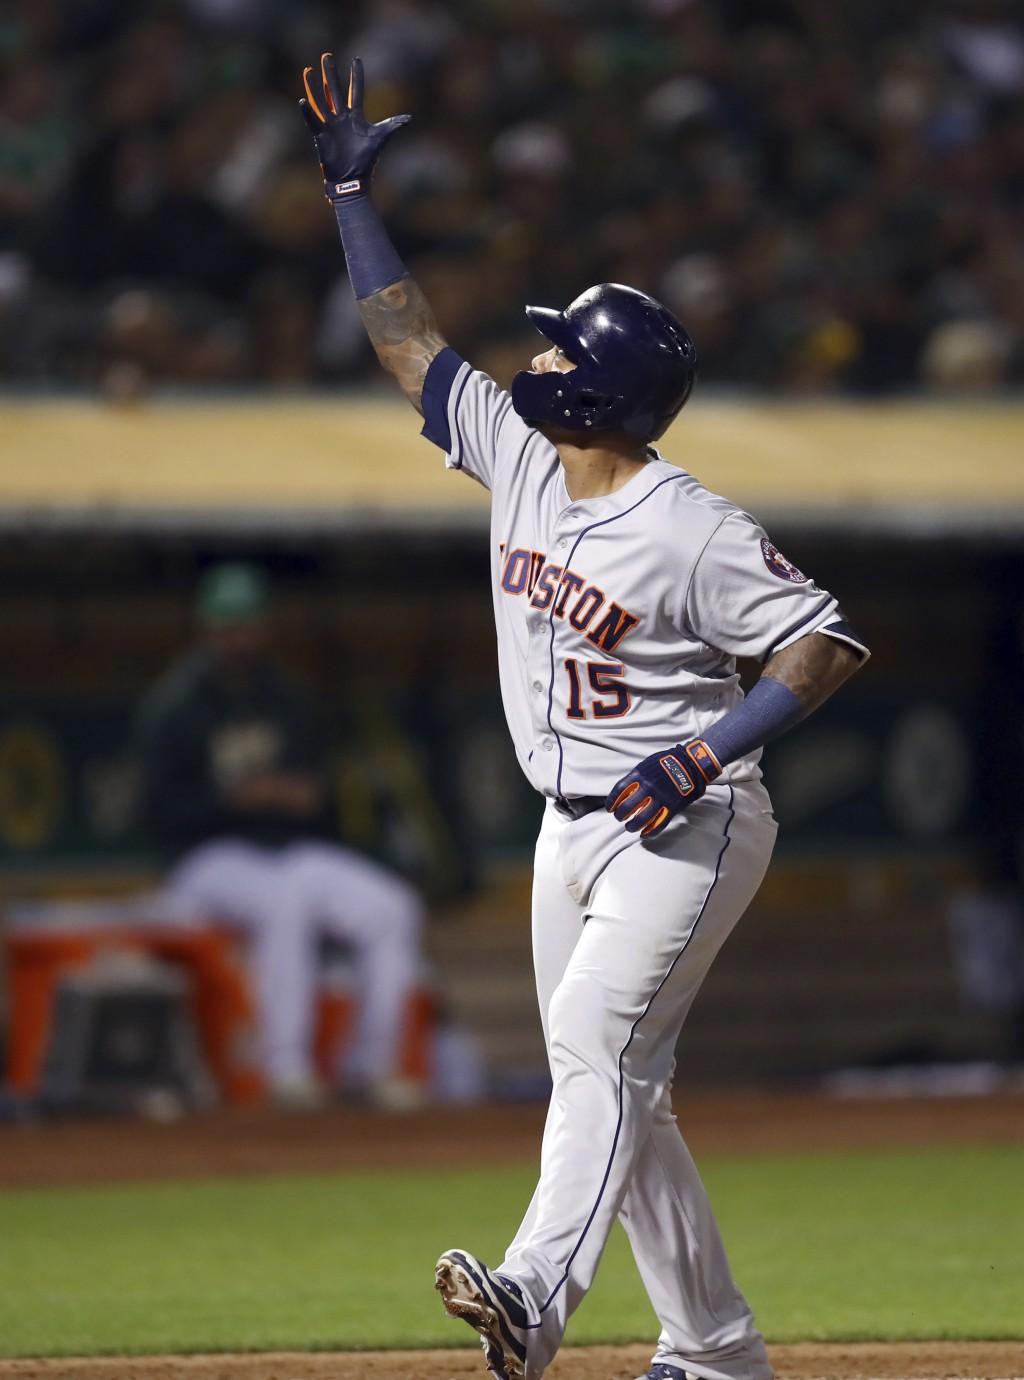 Houston Astros' Martin Maldonado celebrates after hitting a home run off Oakland Athletics' Edwin Jackson in the fifth inning of a baseball game Frida...